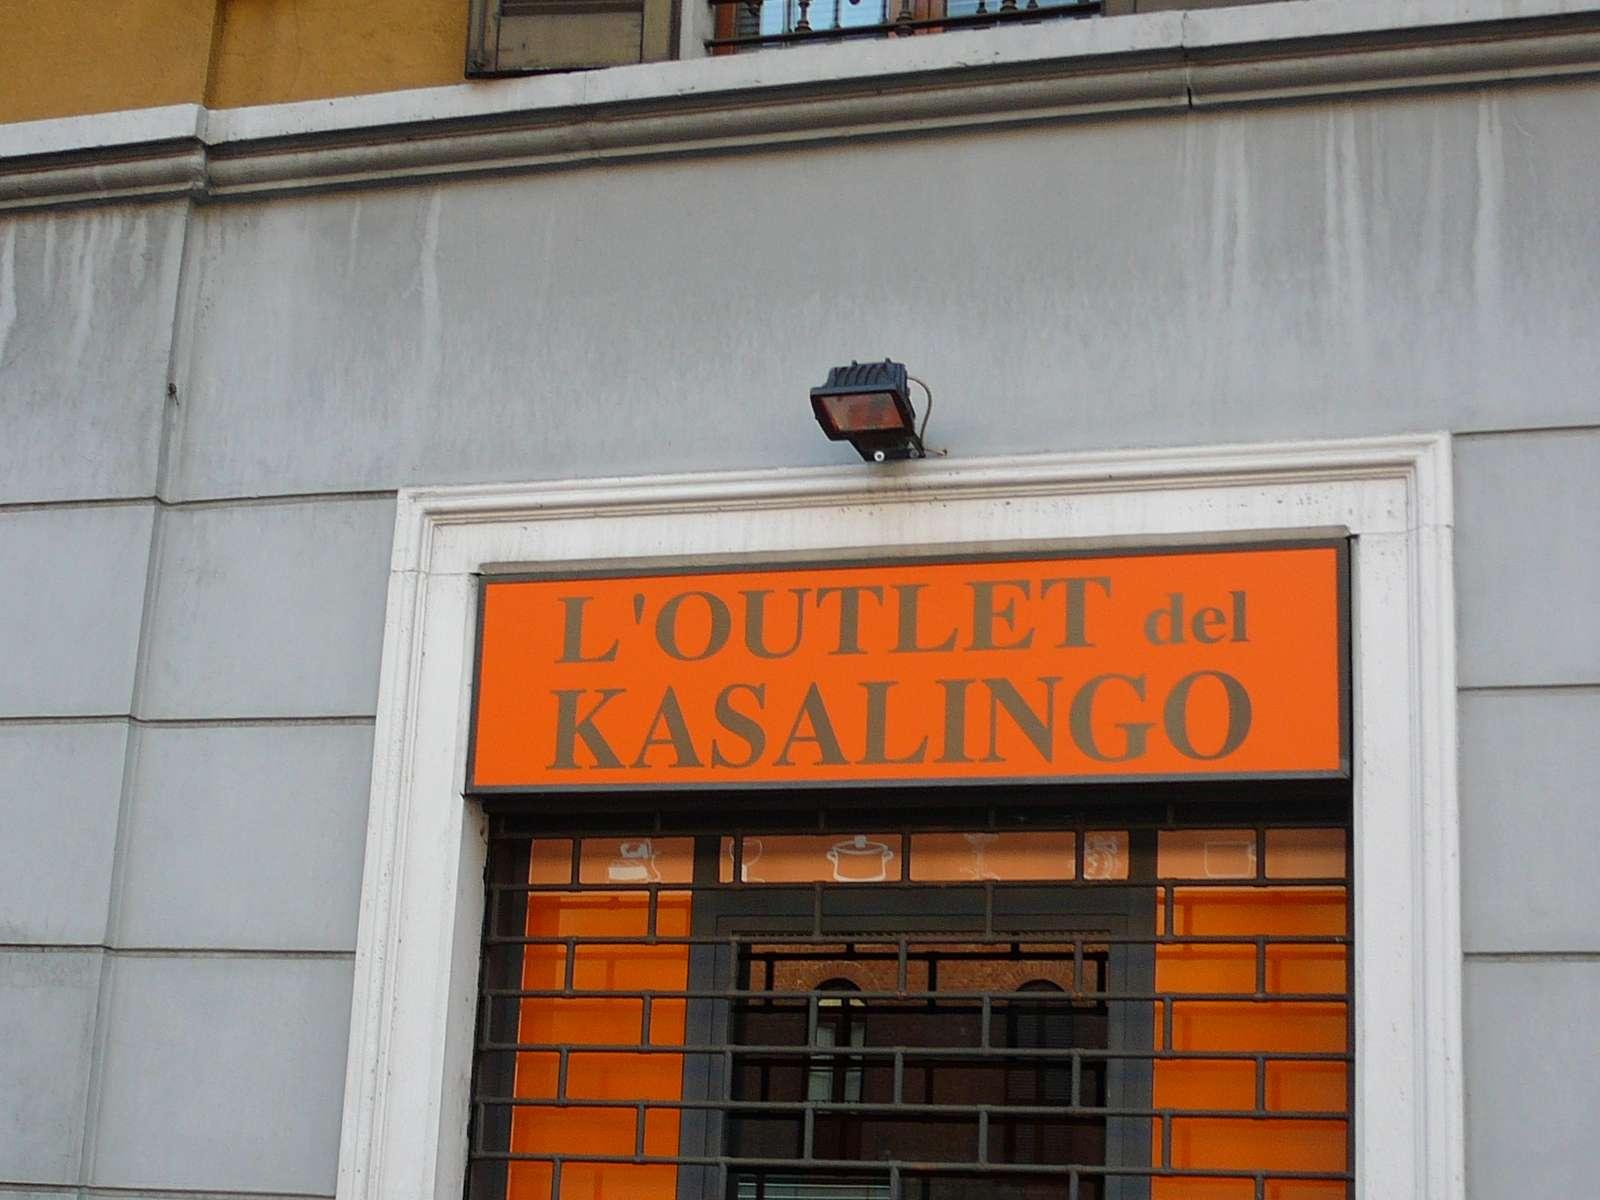 Outlet Casalinghi Milano Images - harrop.us - harrop.us